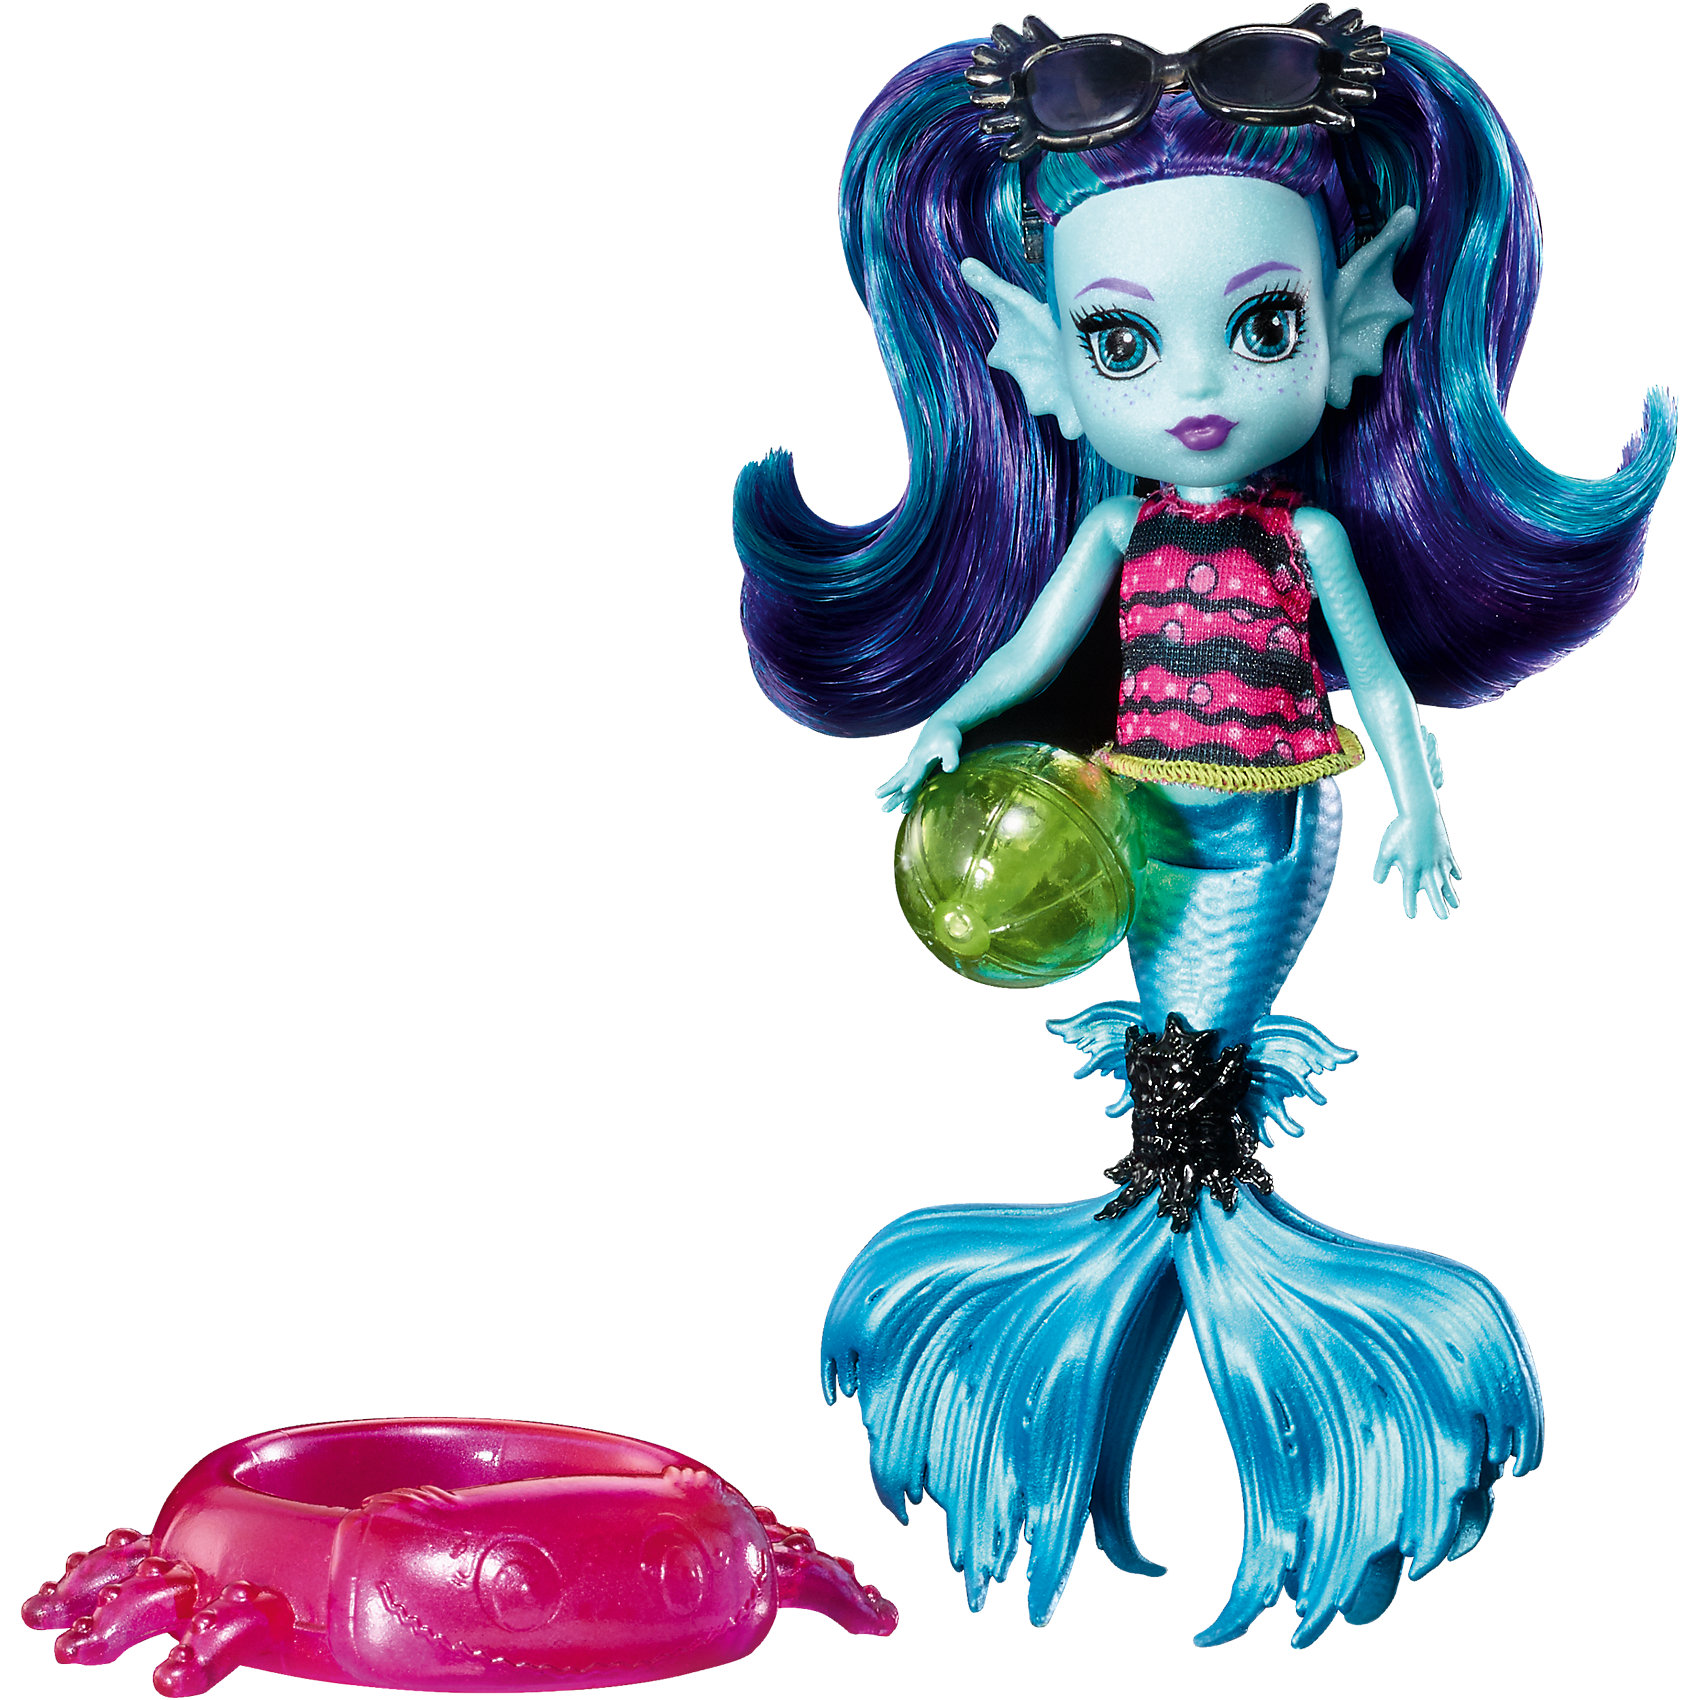 Мини-монстряшка Monster High Эбби Блю из серии Семья МонстриковМини-куклы<br><br><br>Ширина мм: 207<br>Глубина мм: 154<br>Высота мм: 40<br>Вес г: 110<br>Возраст от месяцев: 72<br>Возраст до месяцев: 120<br>Пол: Женский<br>Возраст: Детский<br>SKU: 6746583